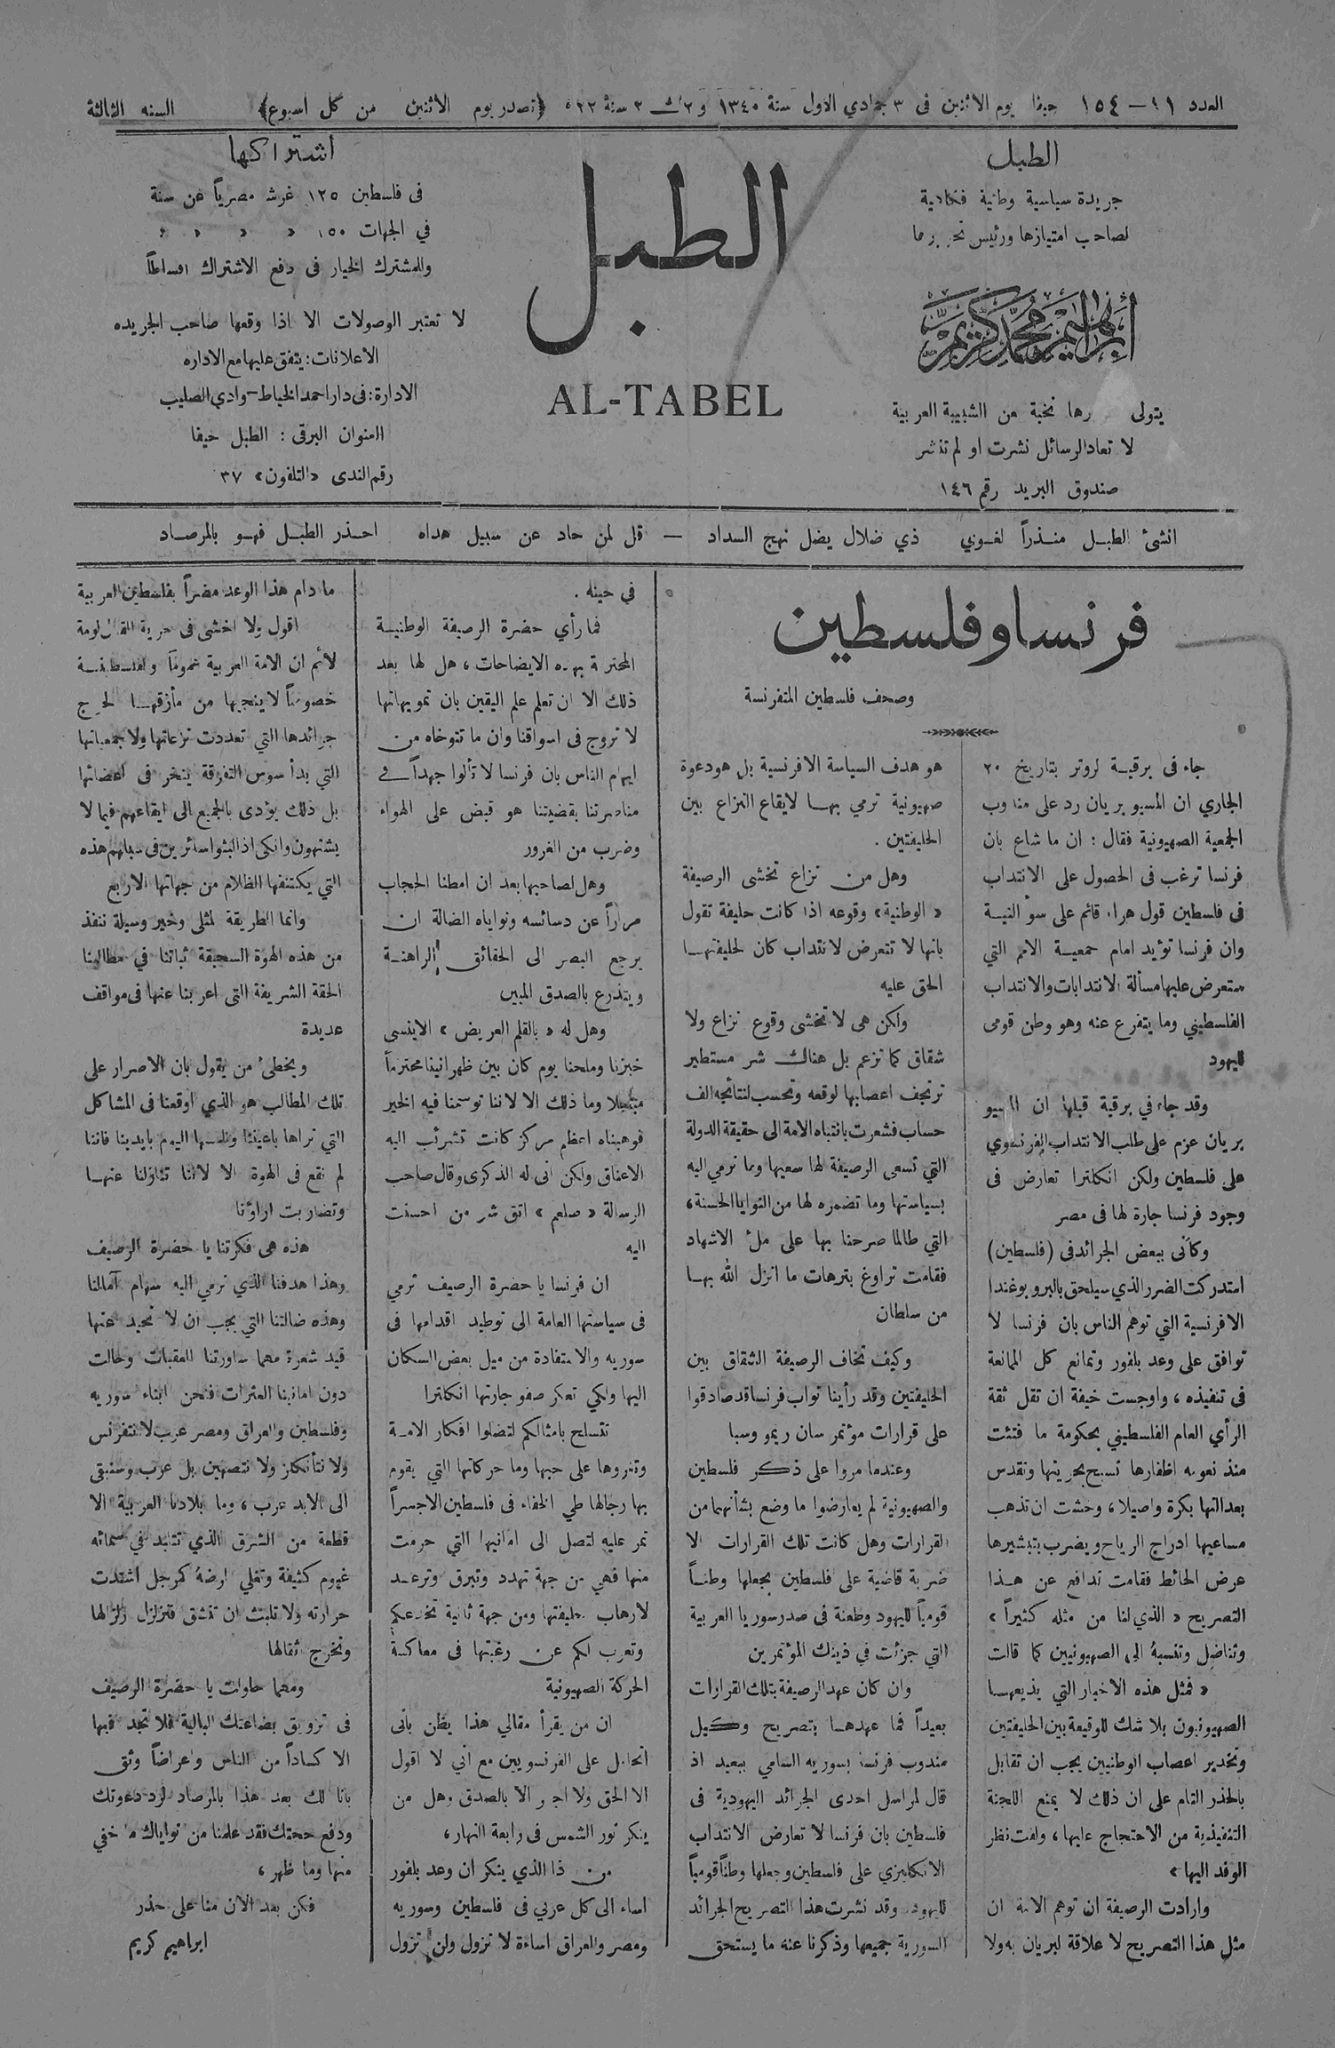 الطبل جريده عربيه اجتماعيه نقديه ساخره صدرت قي حيفا بين ١٩٢١ ١٩٢٤ Palestine History Bullet Journal History